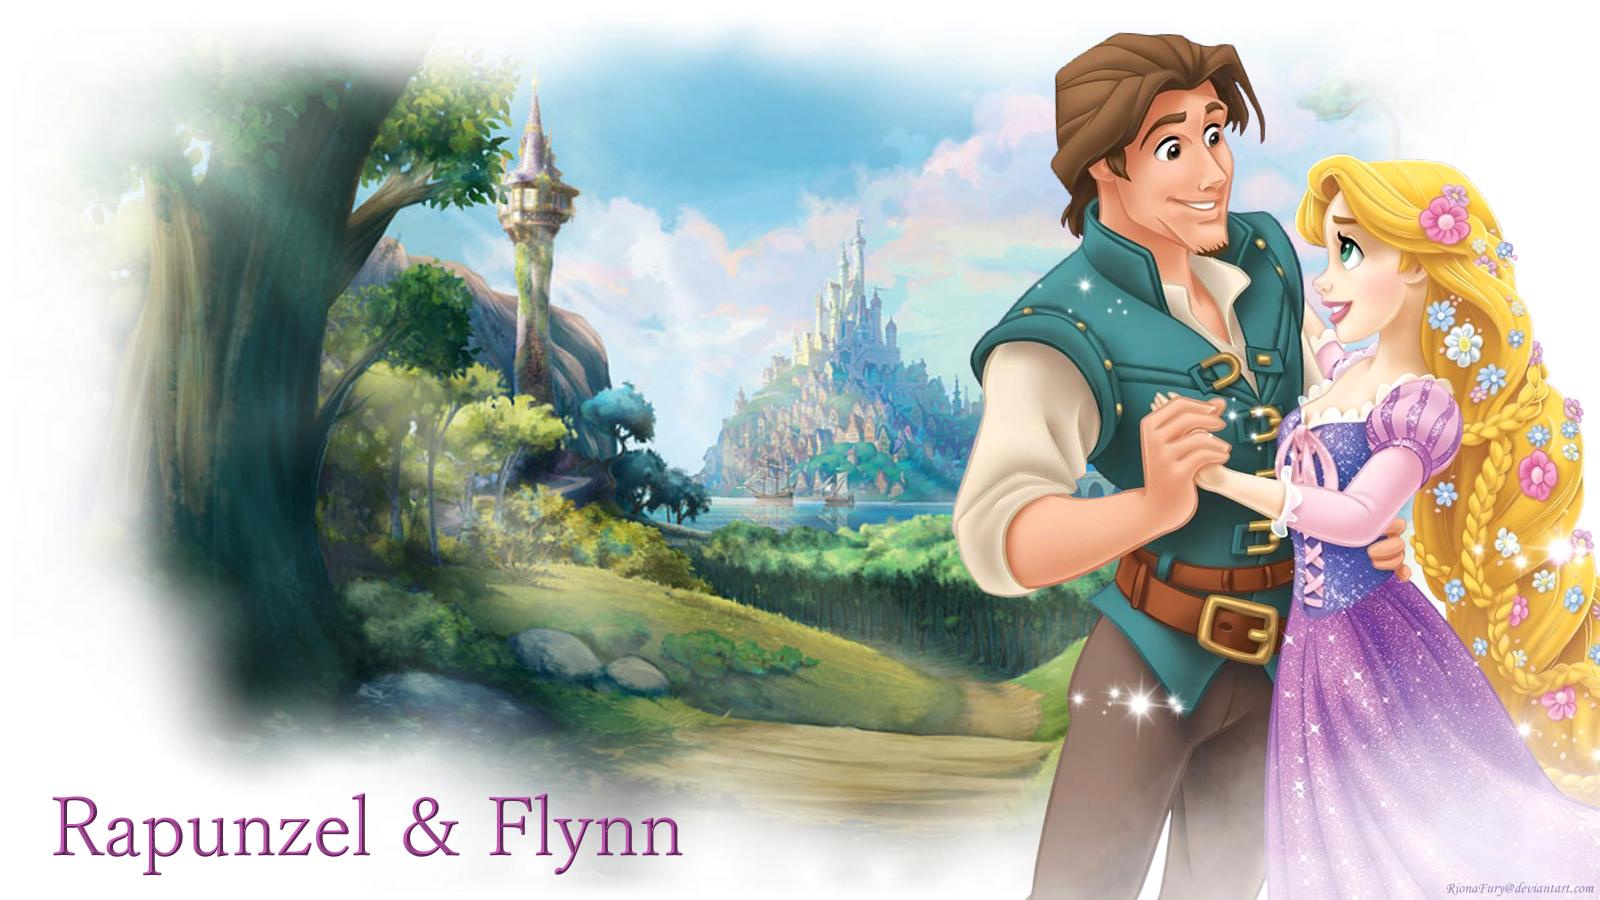 Tangled Couple Disney Princess Wallpaper 37732287 Fanpop